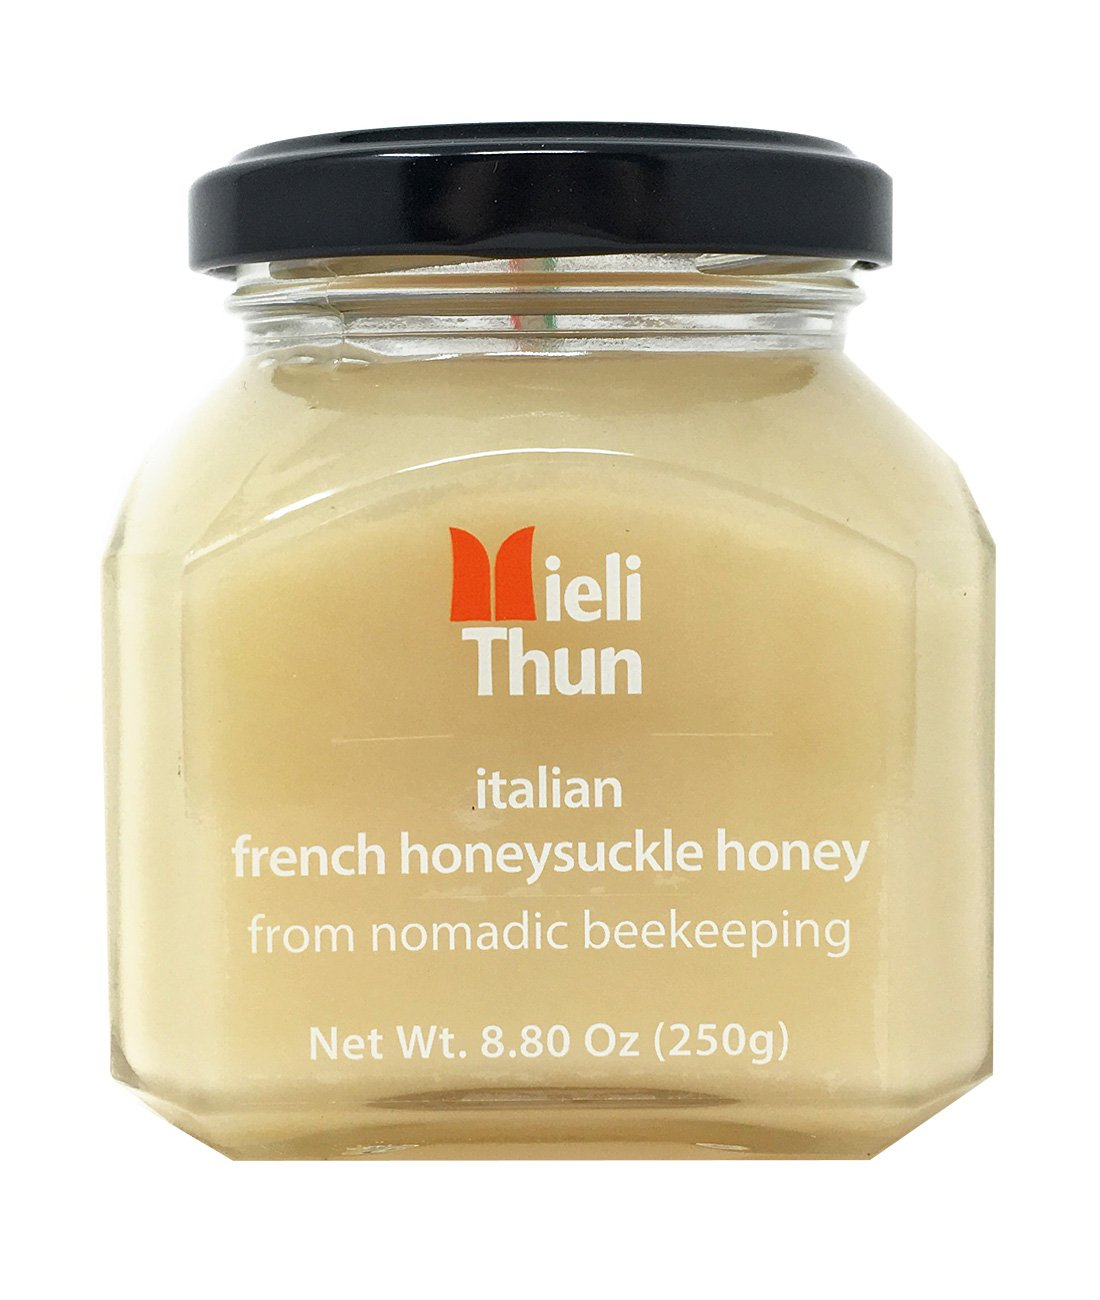 Mieli Thun all natural French Honeysuckle- Honey Sulla - Italy - 8.8 ozs.